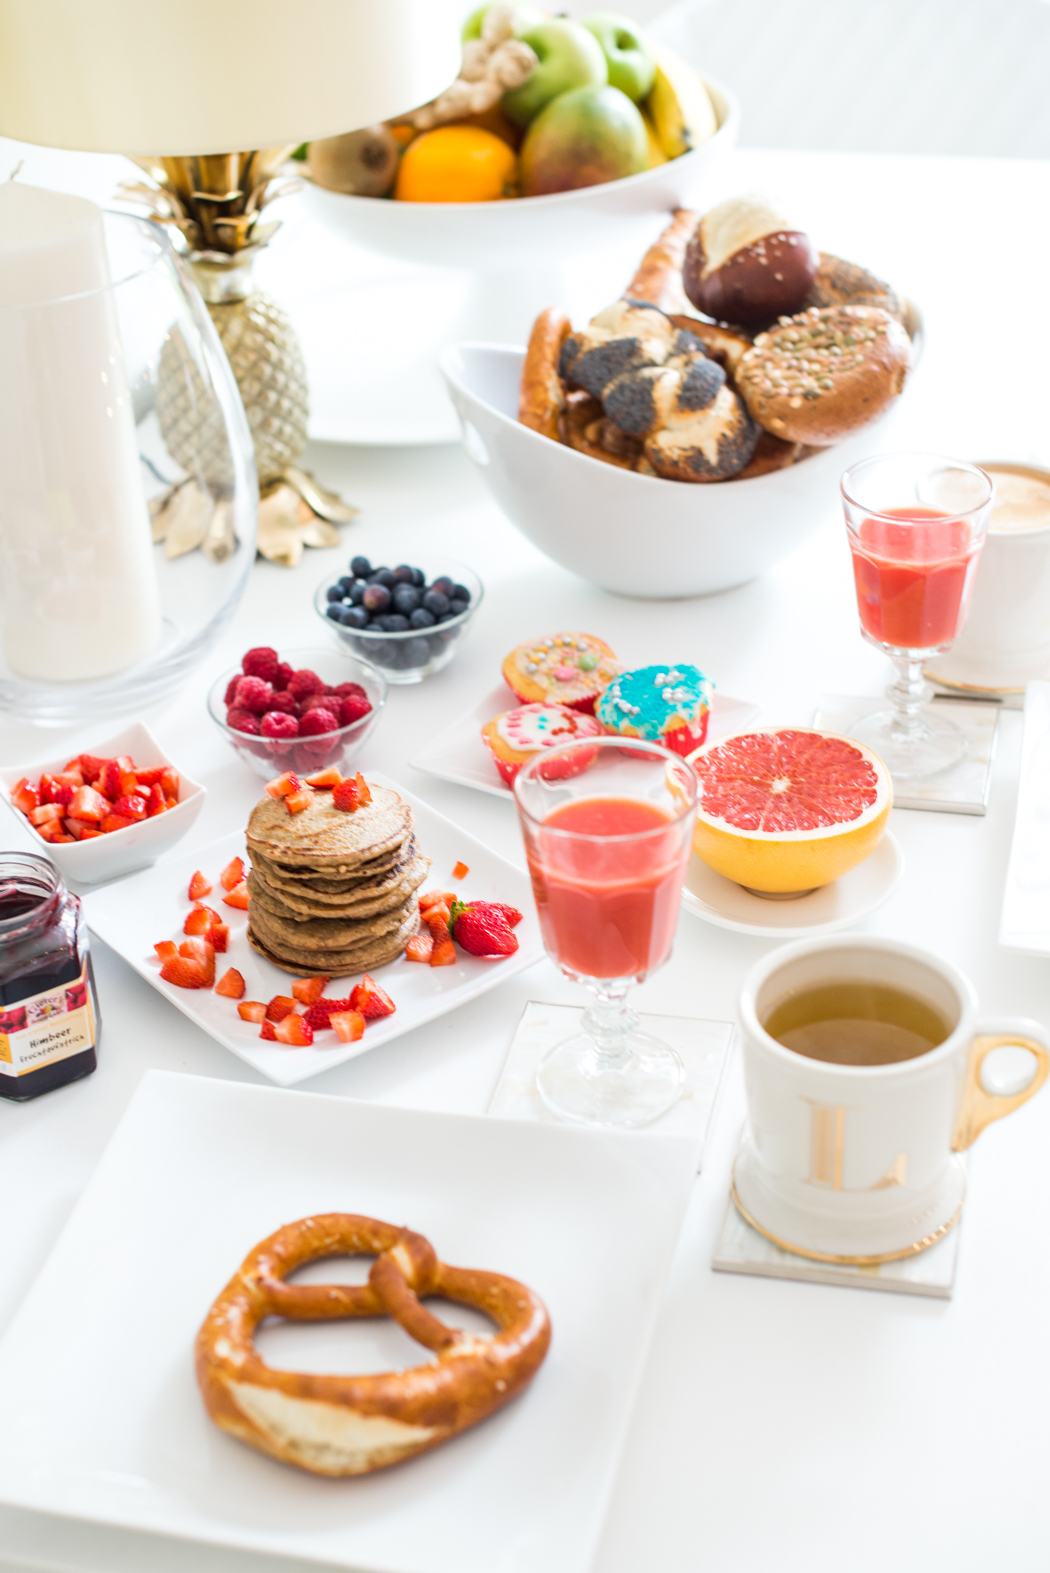 Vegane-Pancakes-Rezept-Lindarella-Bananen-Pancakes-Frühstück-Sonntag-thesundaybreakfast-Veganes-Frühstück-Foodblogger-Foodblog-München-Deutschland-Fashionblog-Fashionblogger